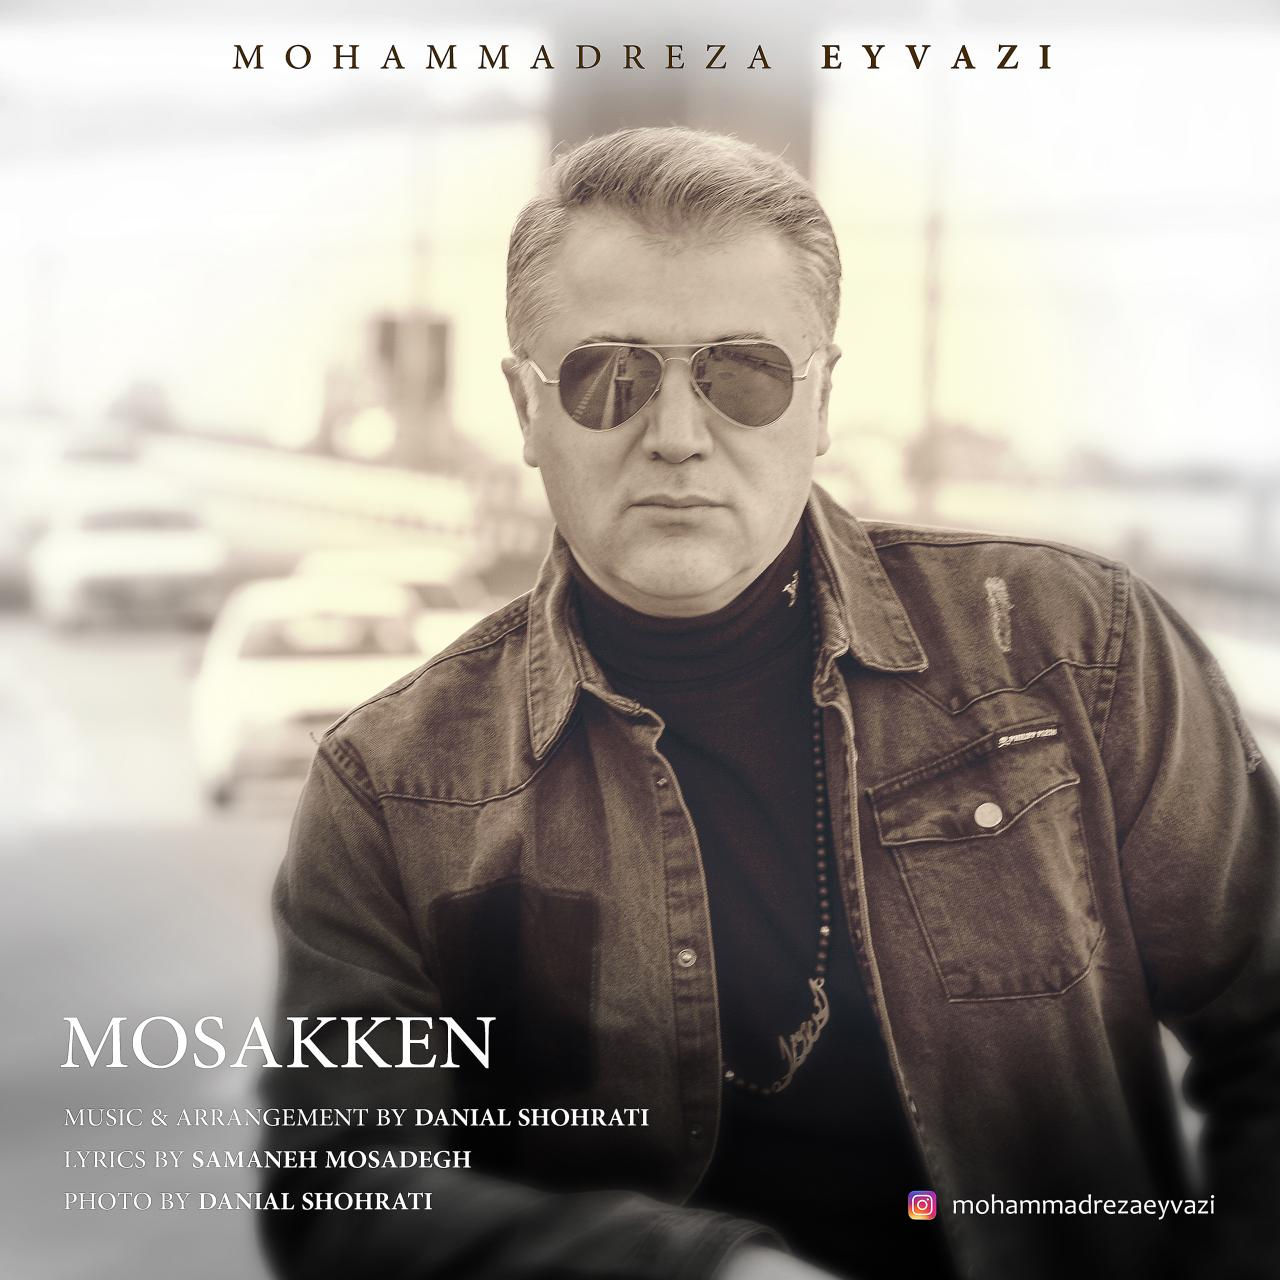 Mohammadreza Eyvazi - Mosakken - دانلود آهنگ محمد رضا عیوضی به نام مُسکن